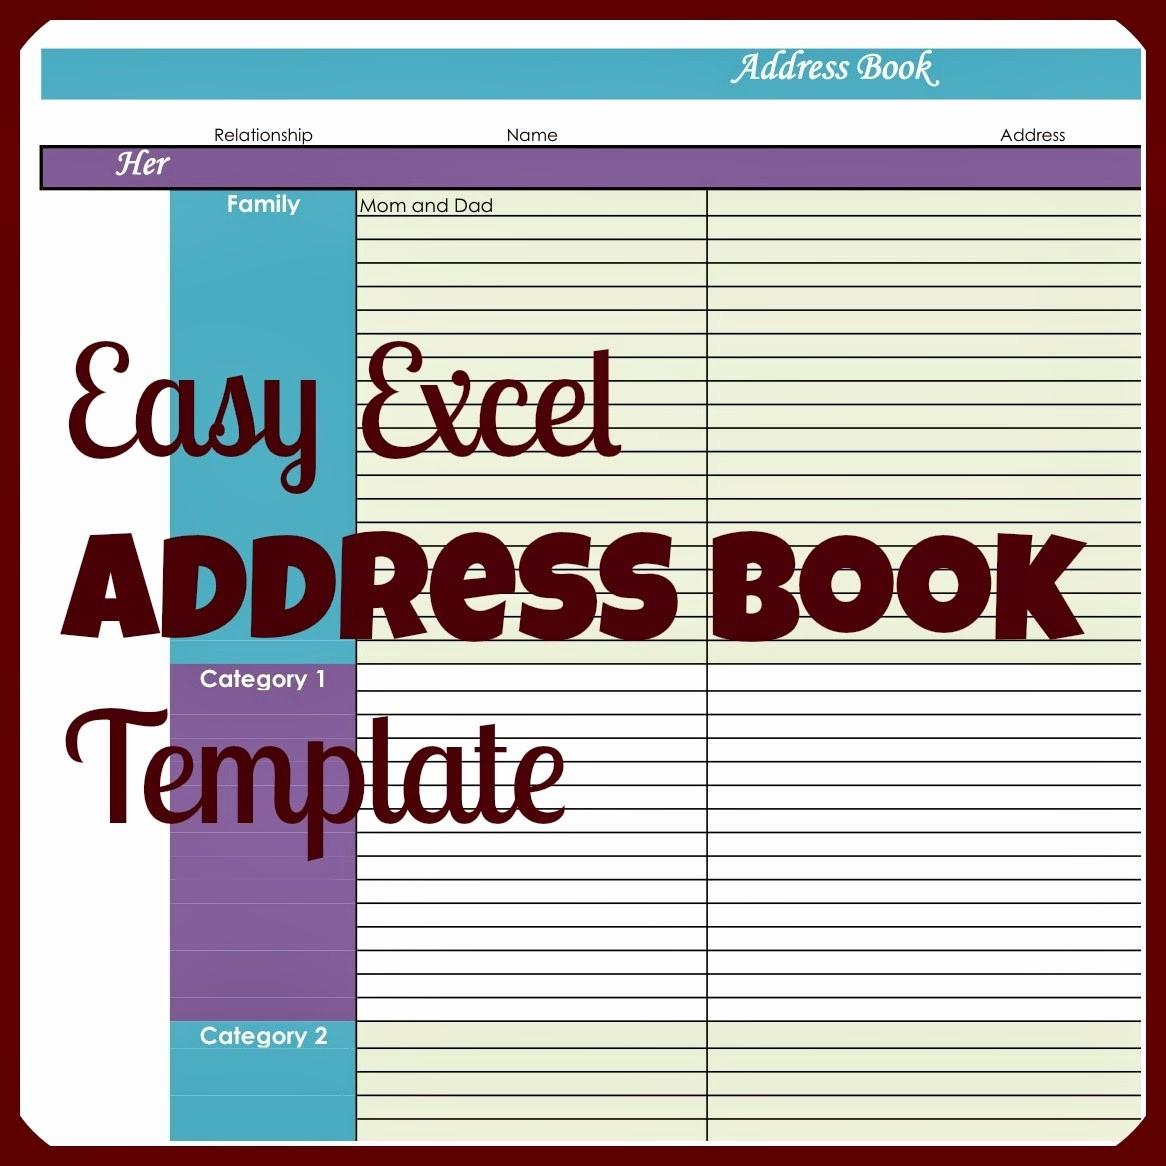 Free Downloadable Address Book Template Unique Laura S Plans Easy Excel Address Book Template